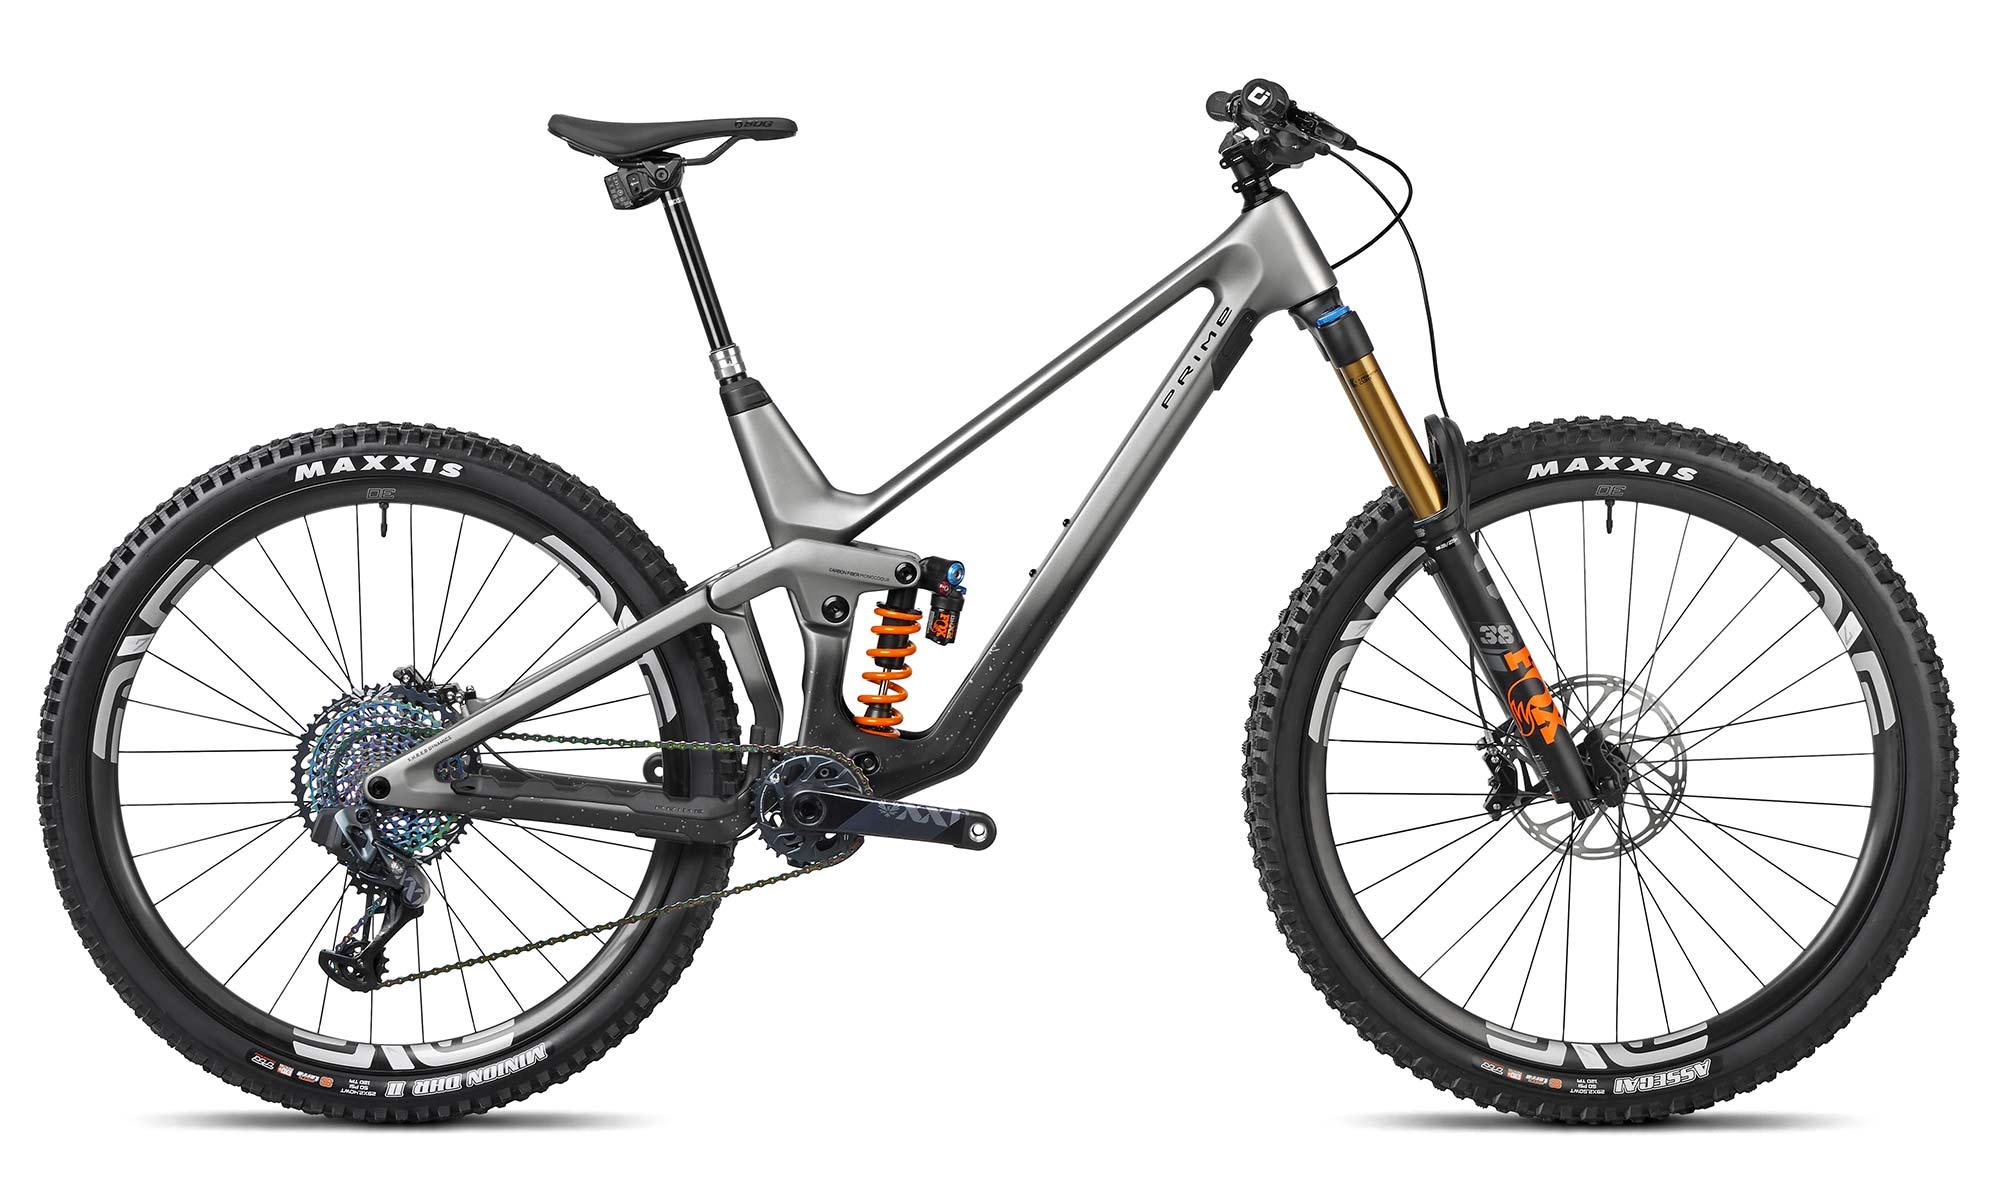 2021 Prime Thunderflash EN bike, affordable consumer-direct carbon 29er enduro mountain bike, RSX